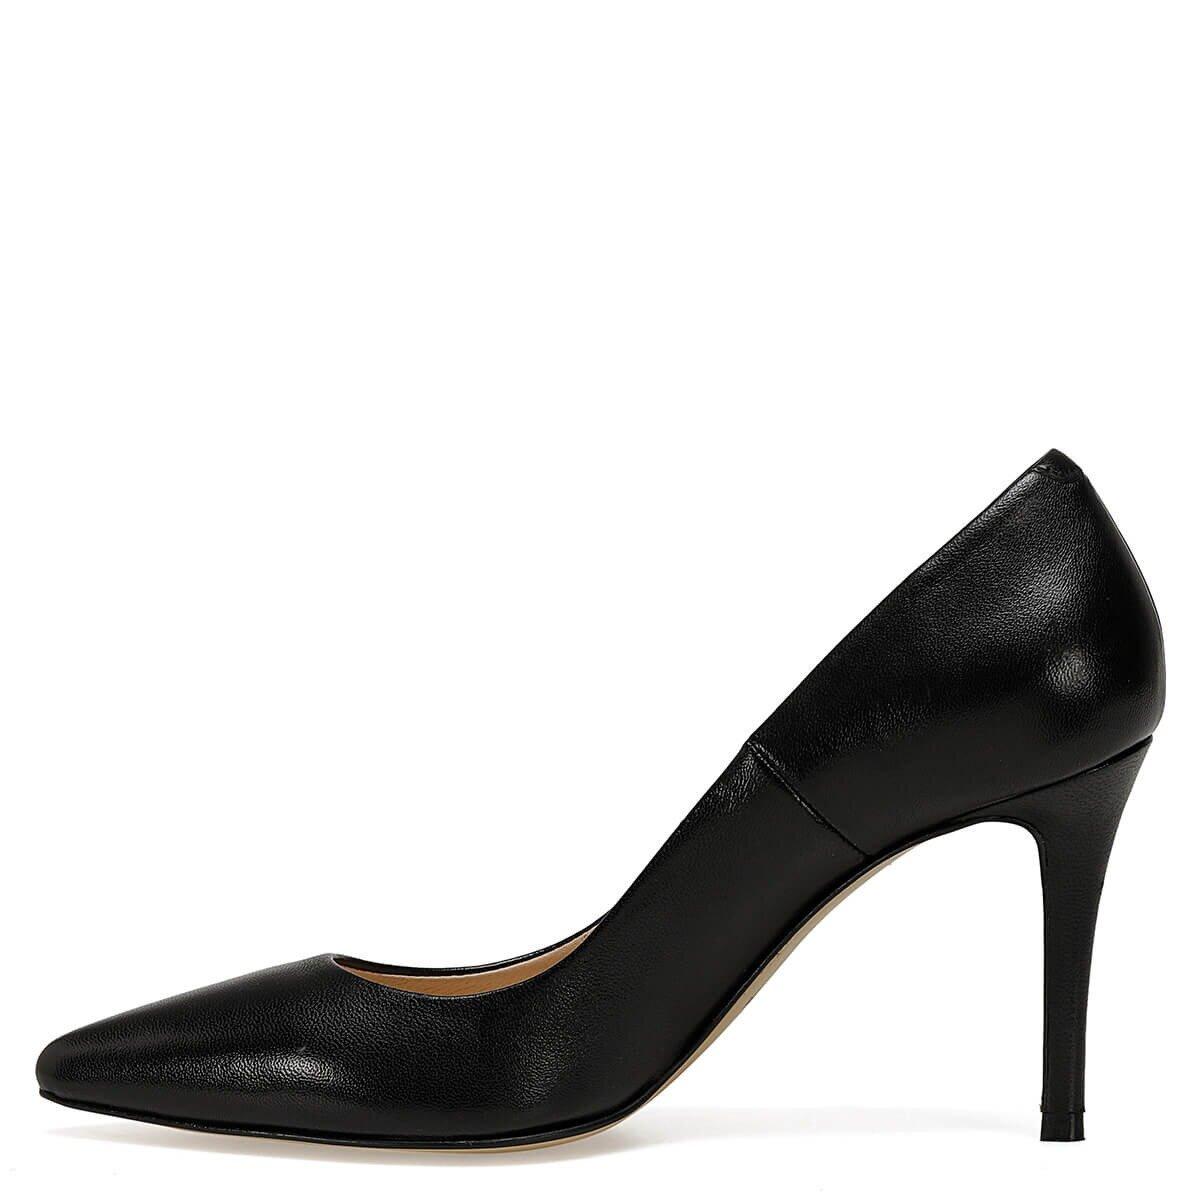 JACKIE Siyah Kadın Topuklu Ayakkabı